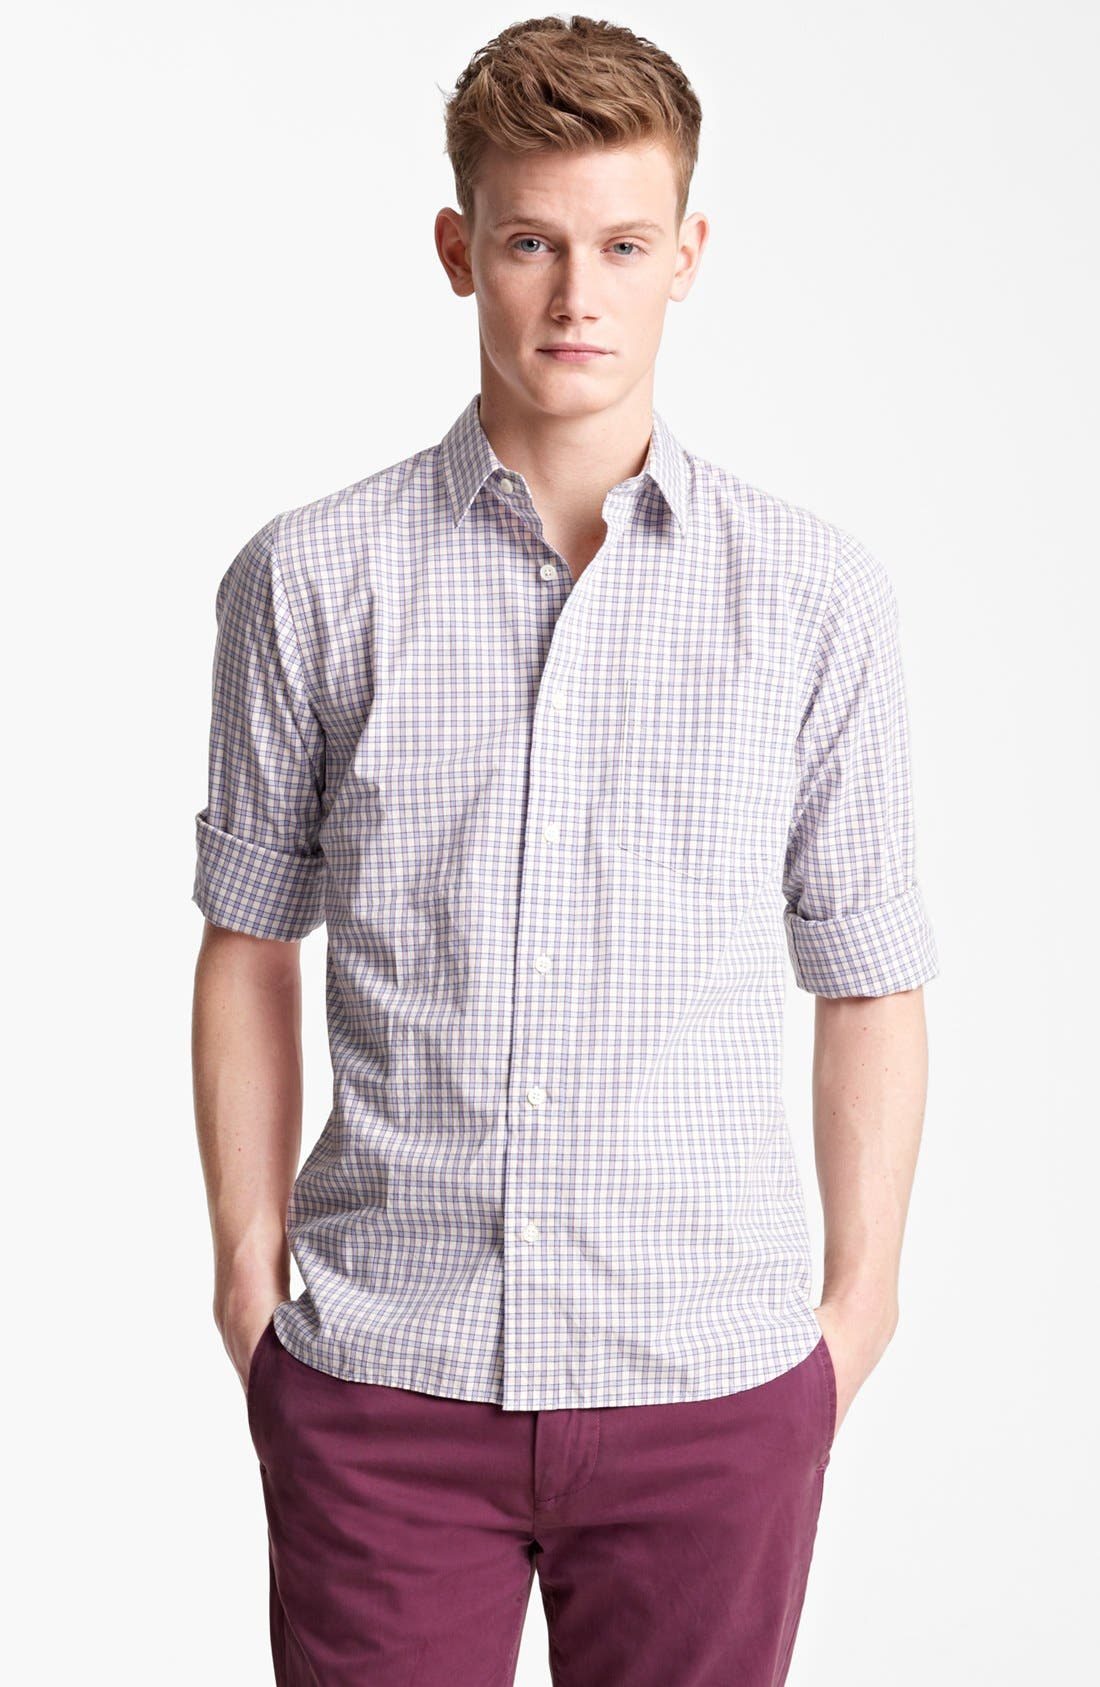 Alternate Image 1 Selected - Jack Spade 'Yates' Check Cotton Shirt